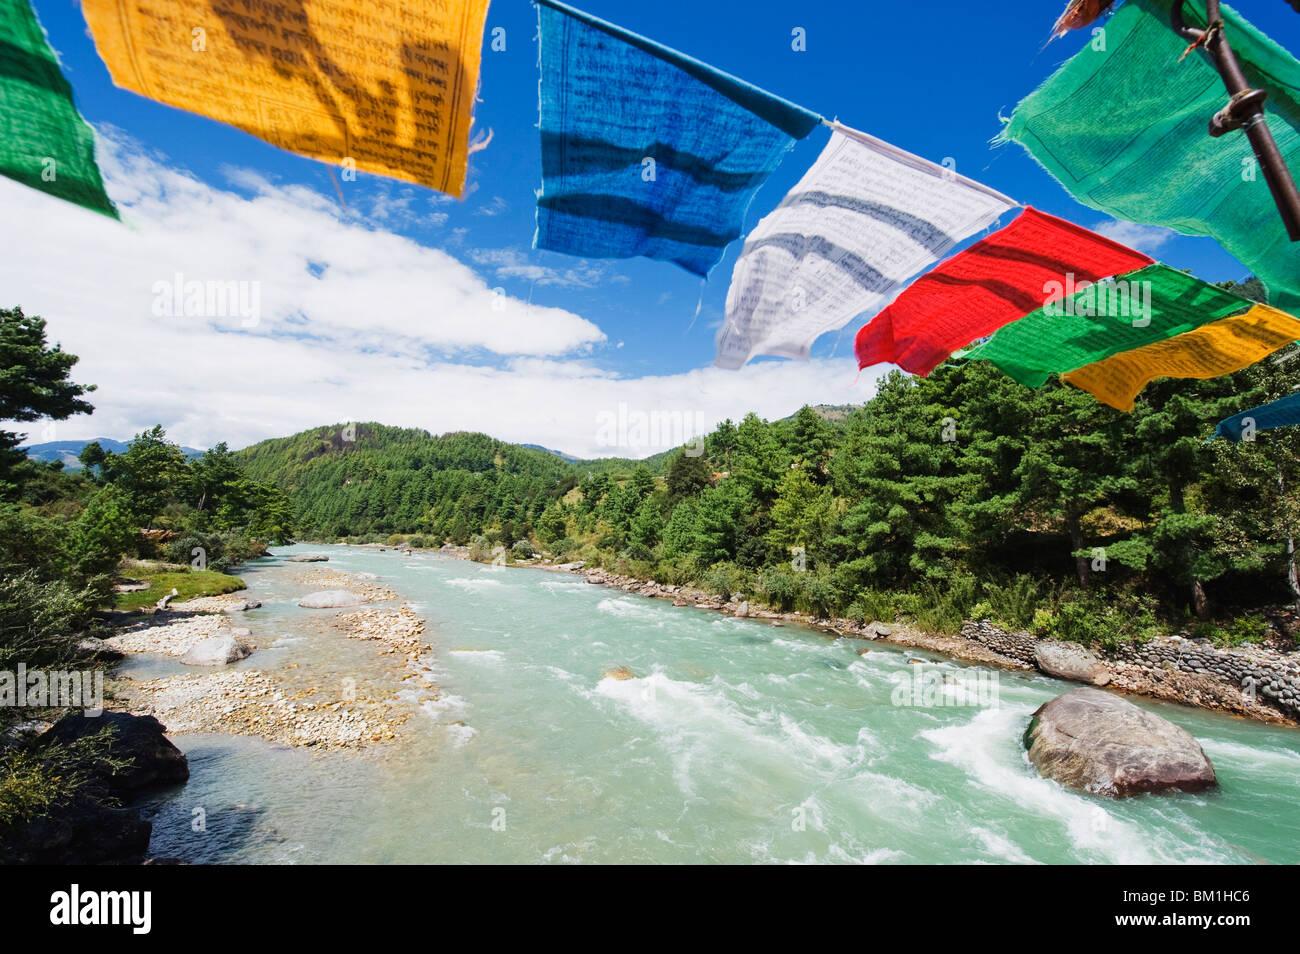 Prayer flags on a bridge, Bumthang, Chokor Valley, Bhutan, Asia - Stock Image